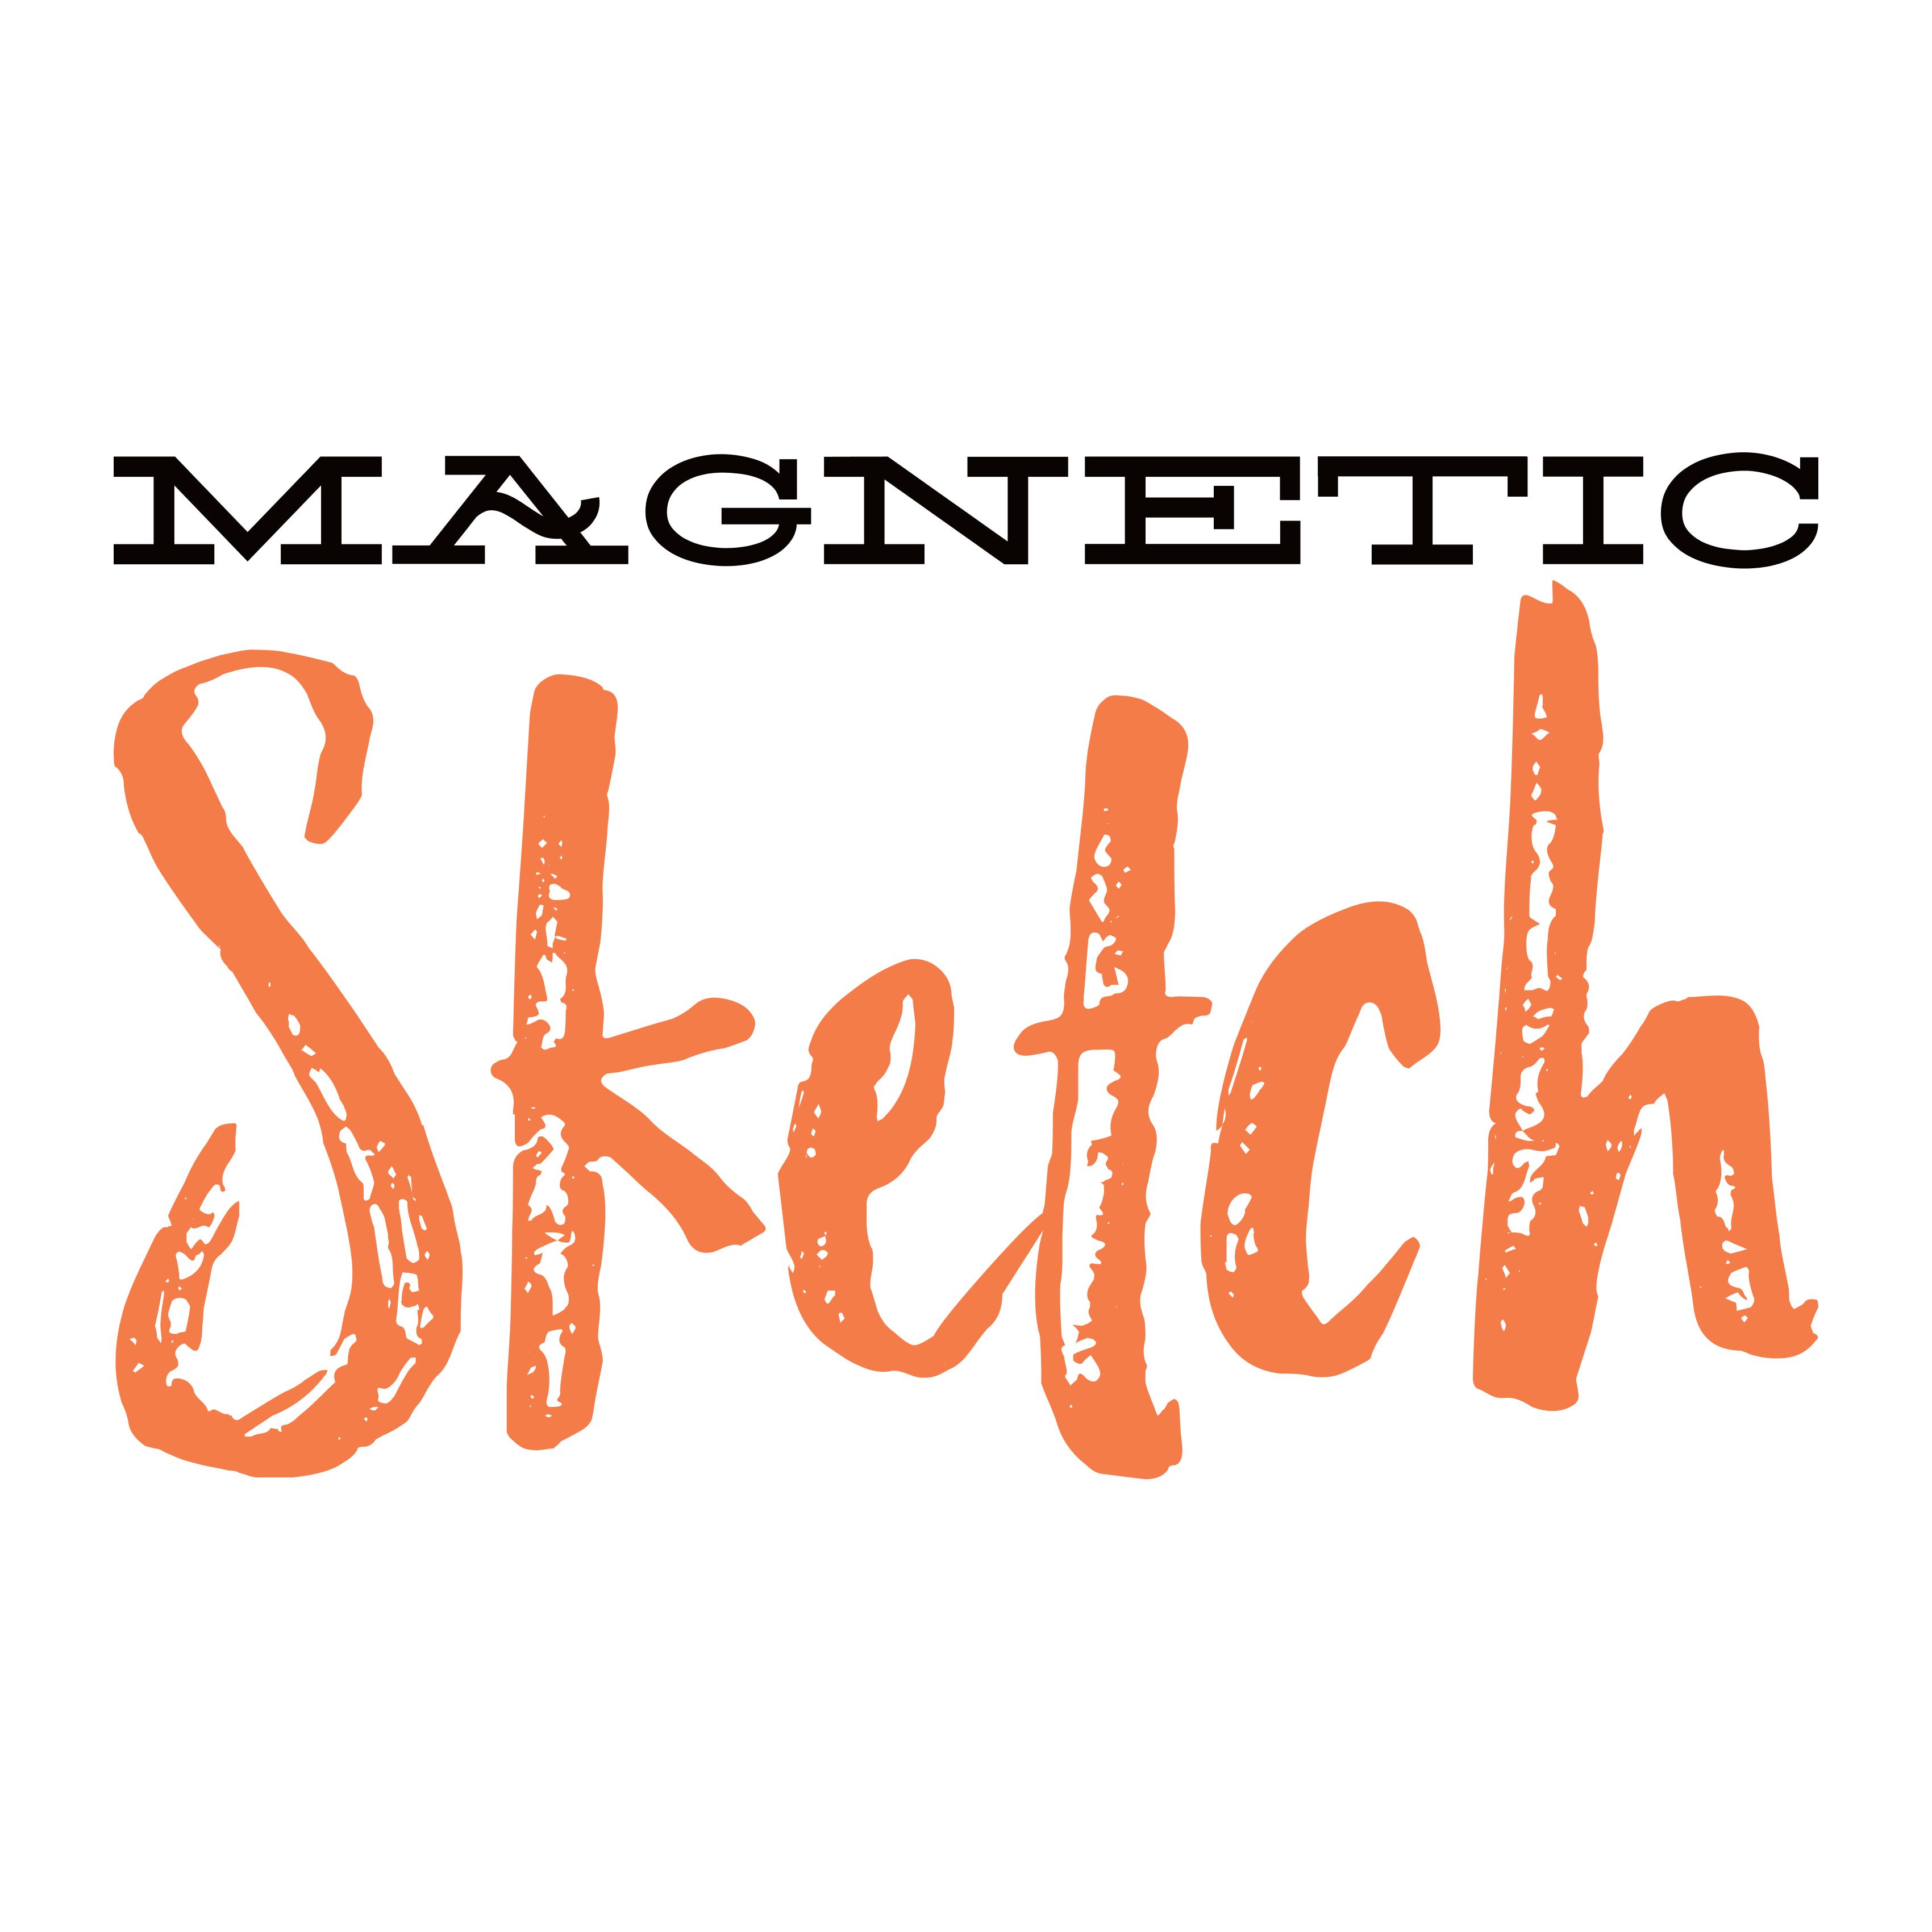 Magnetic Sketch